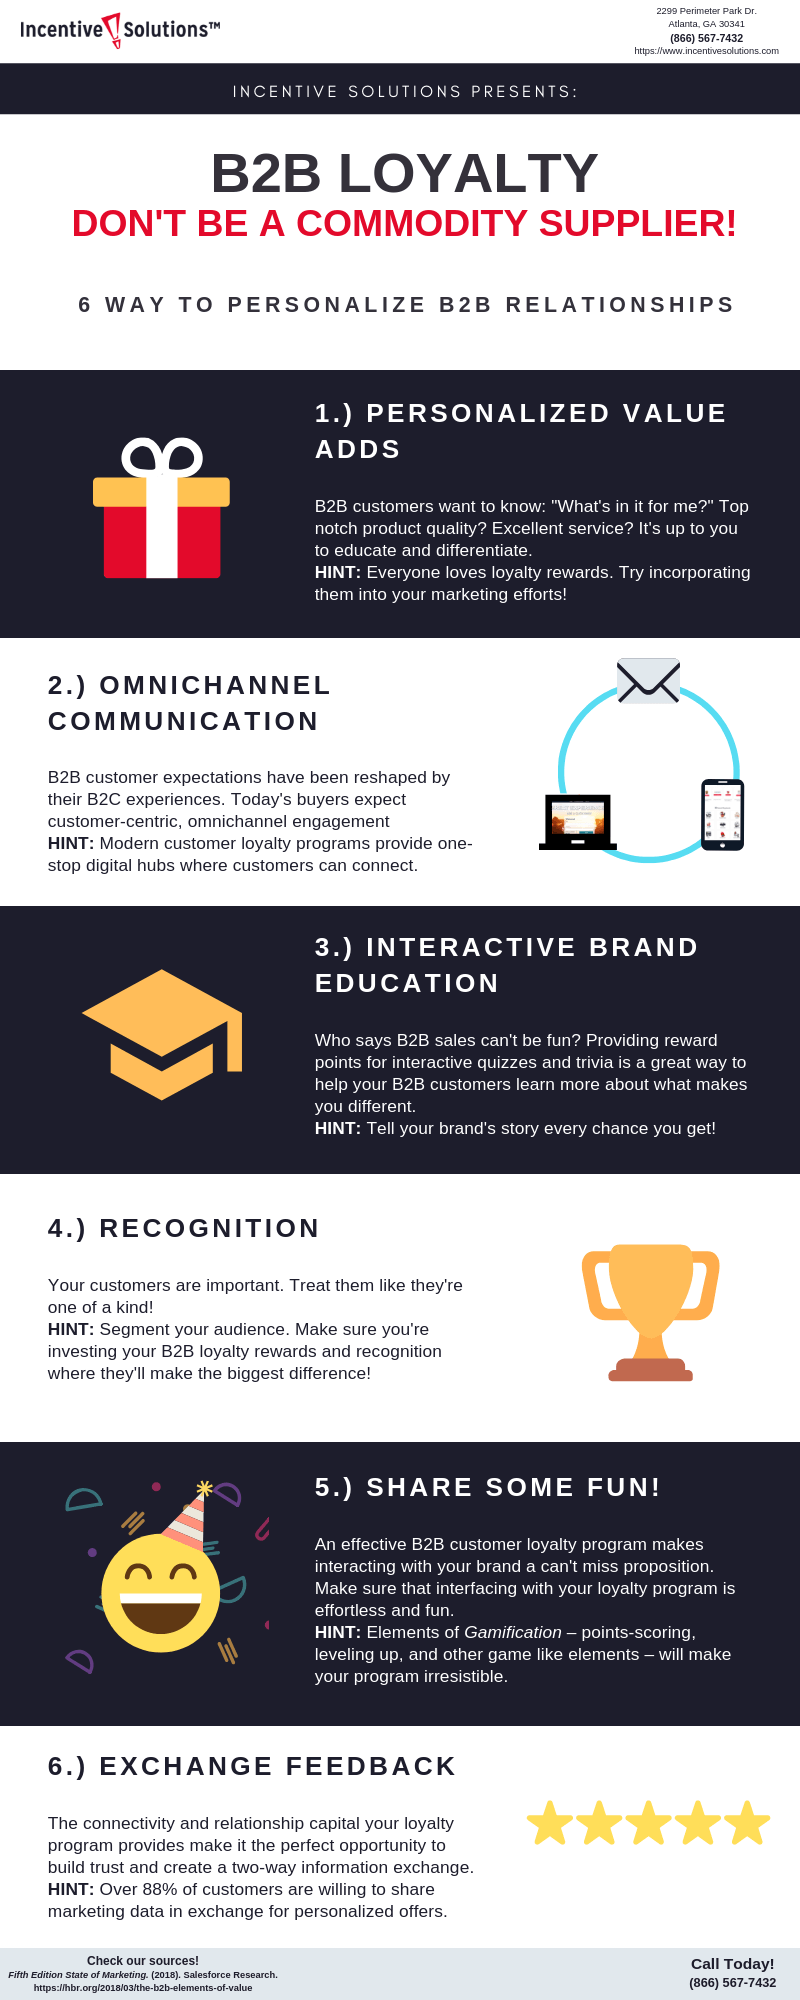 B2B Loyalty Program Strategy Infographic Preview